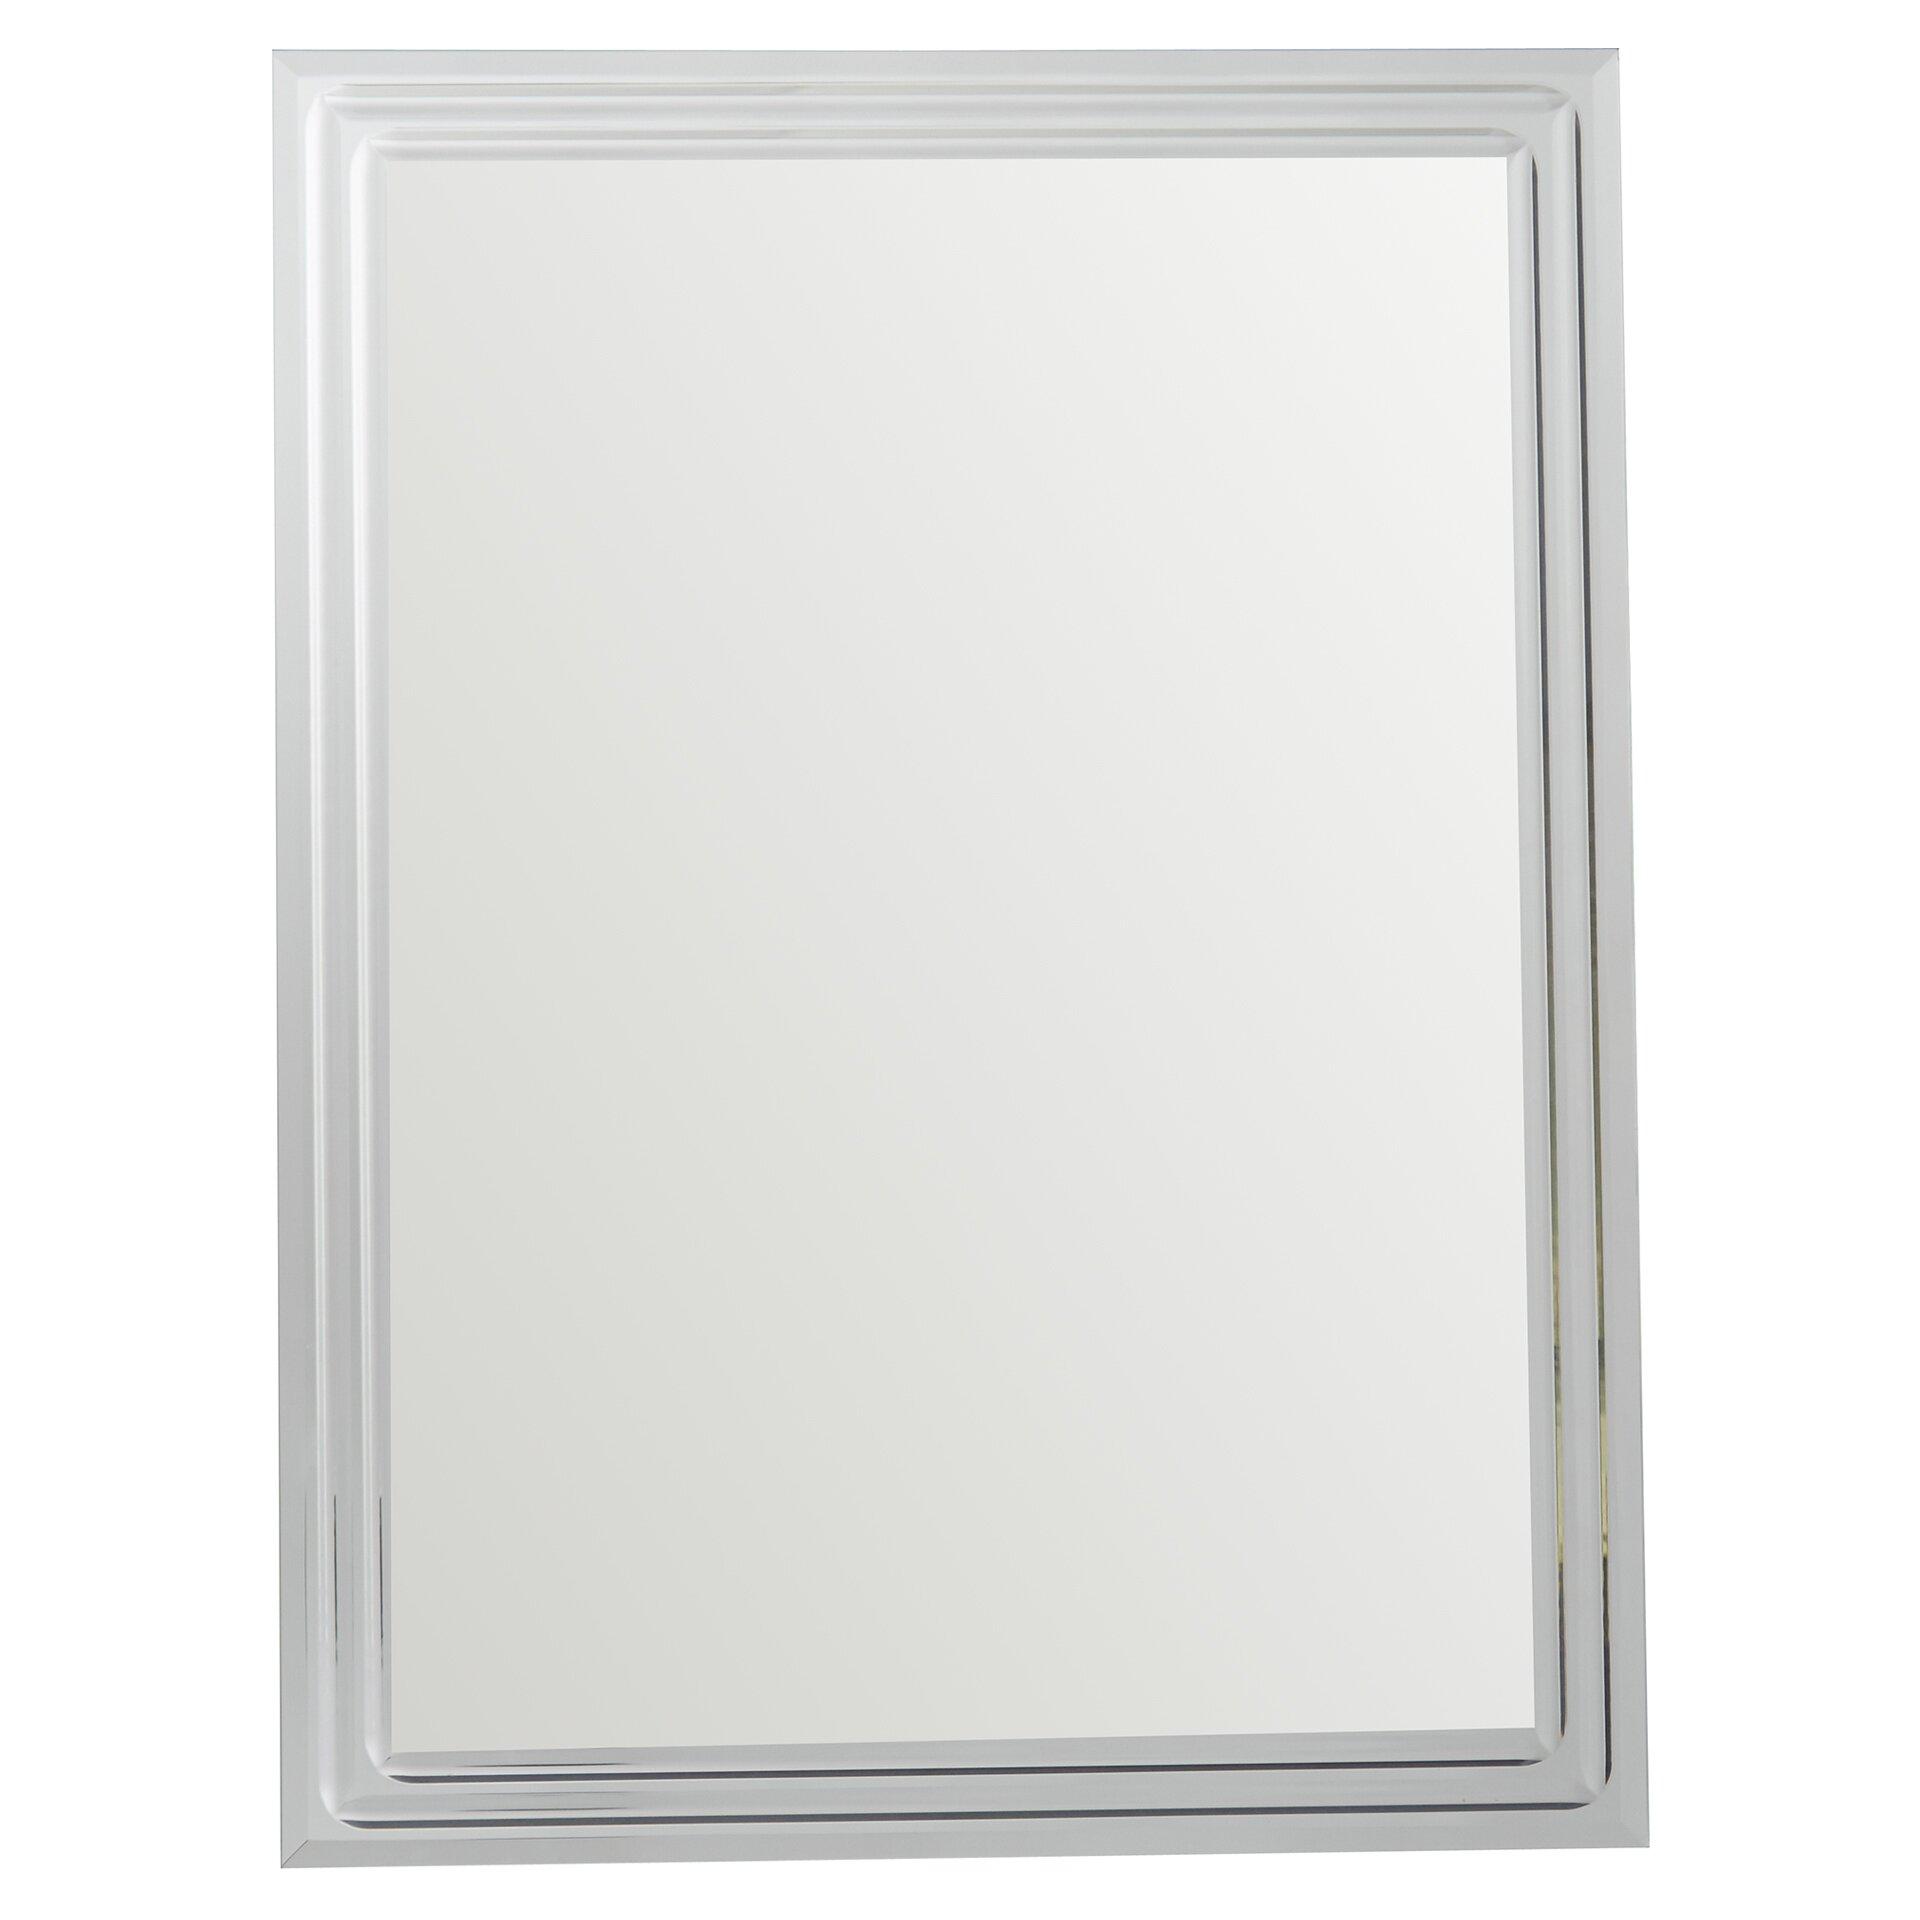 Bevelled Bathroom Mirror Brayden Studio Frameless Tri Bevel Wall Mirror Reviews Wayfair